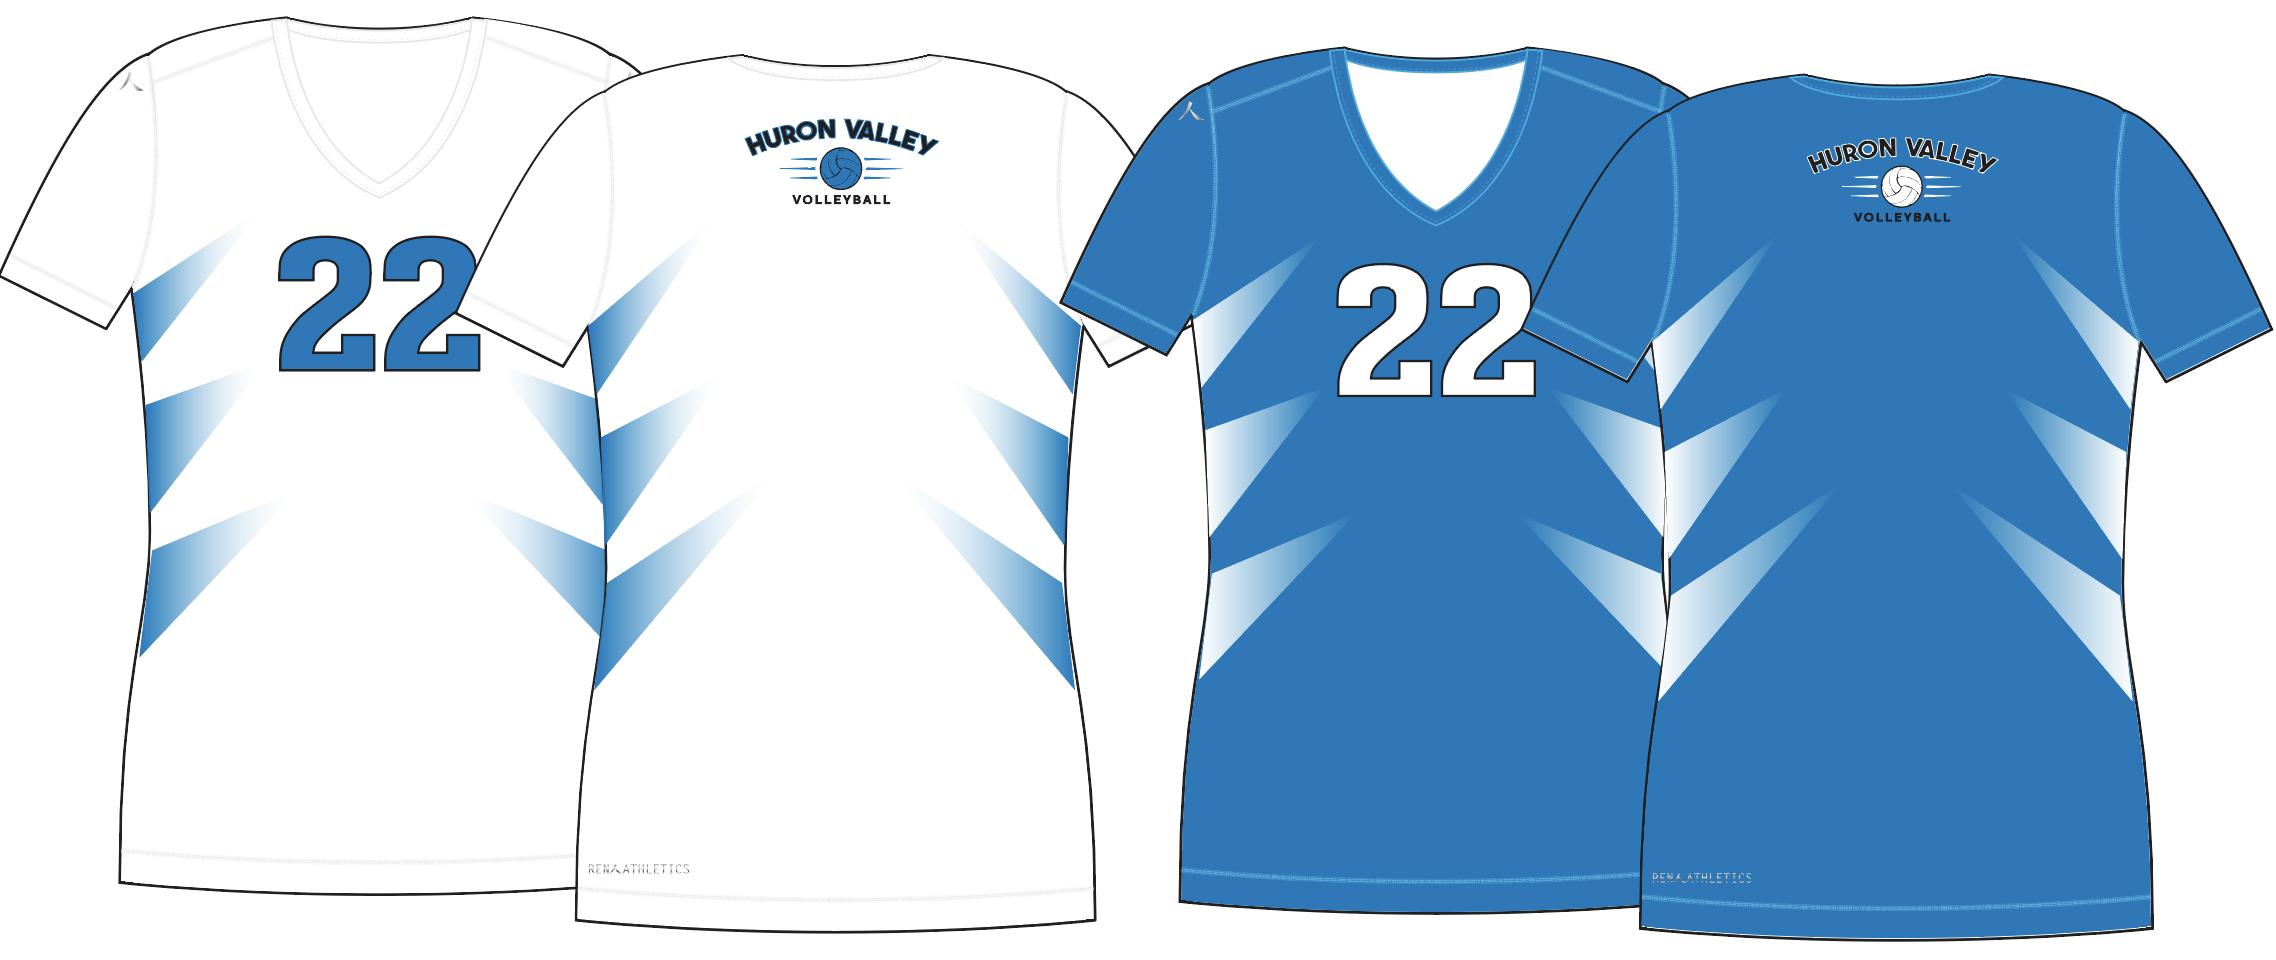 HVVC Custom Uniforms